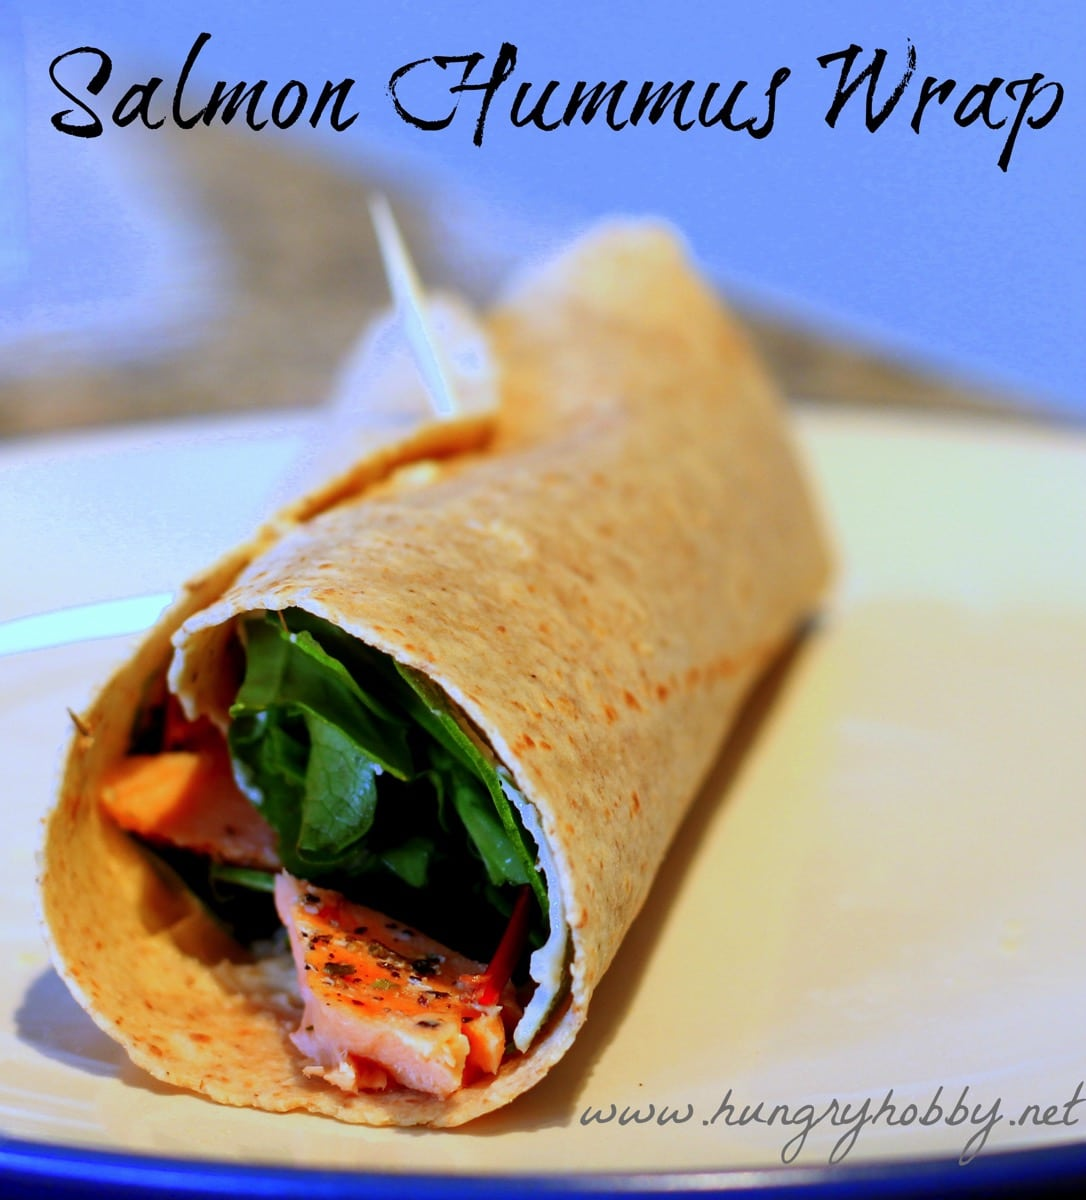 Salmon hummus wrap www hungryhobby net